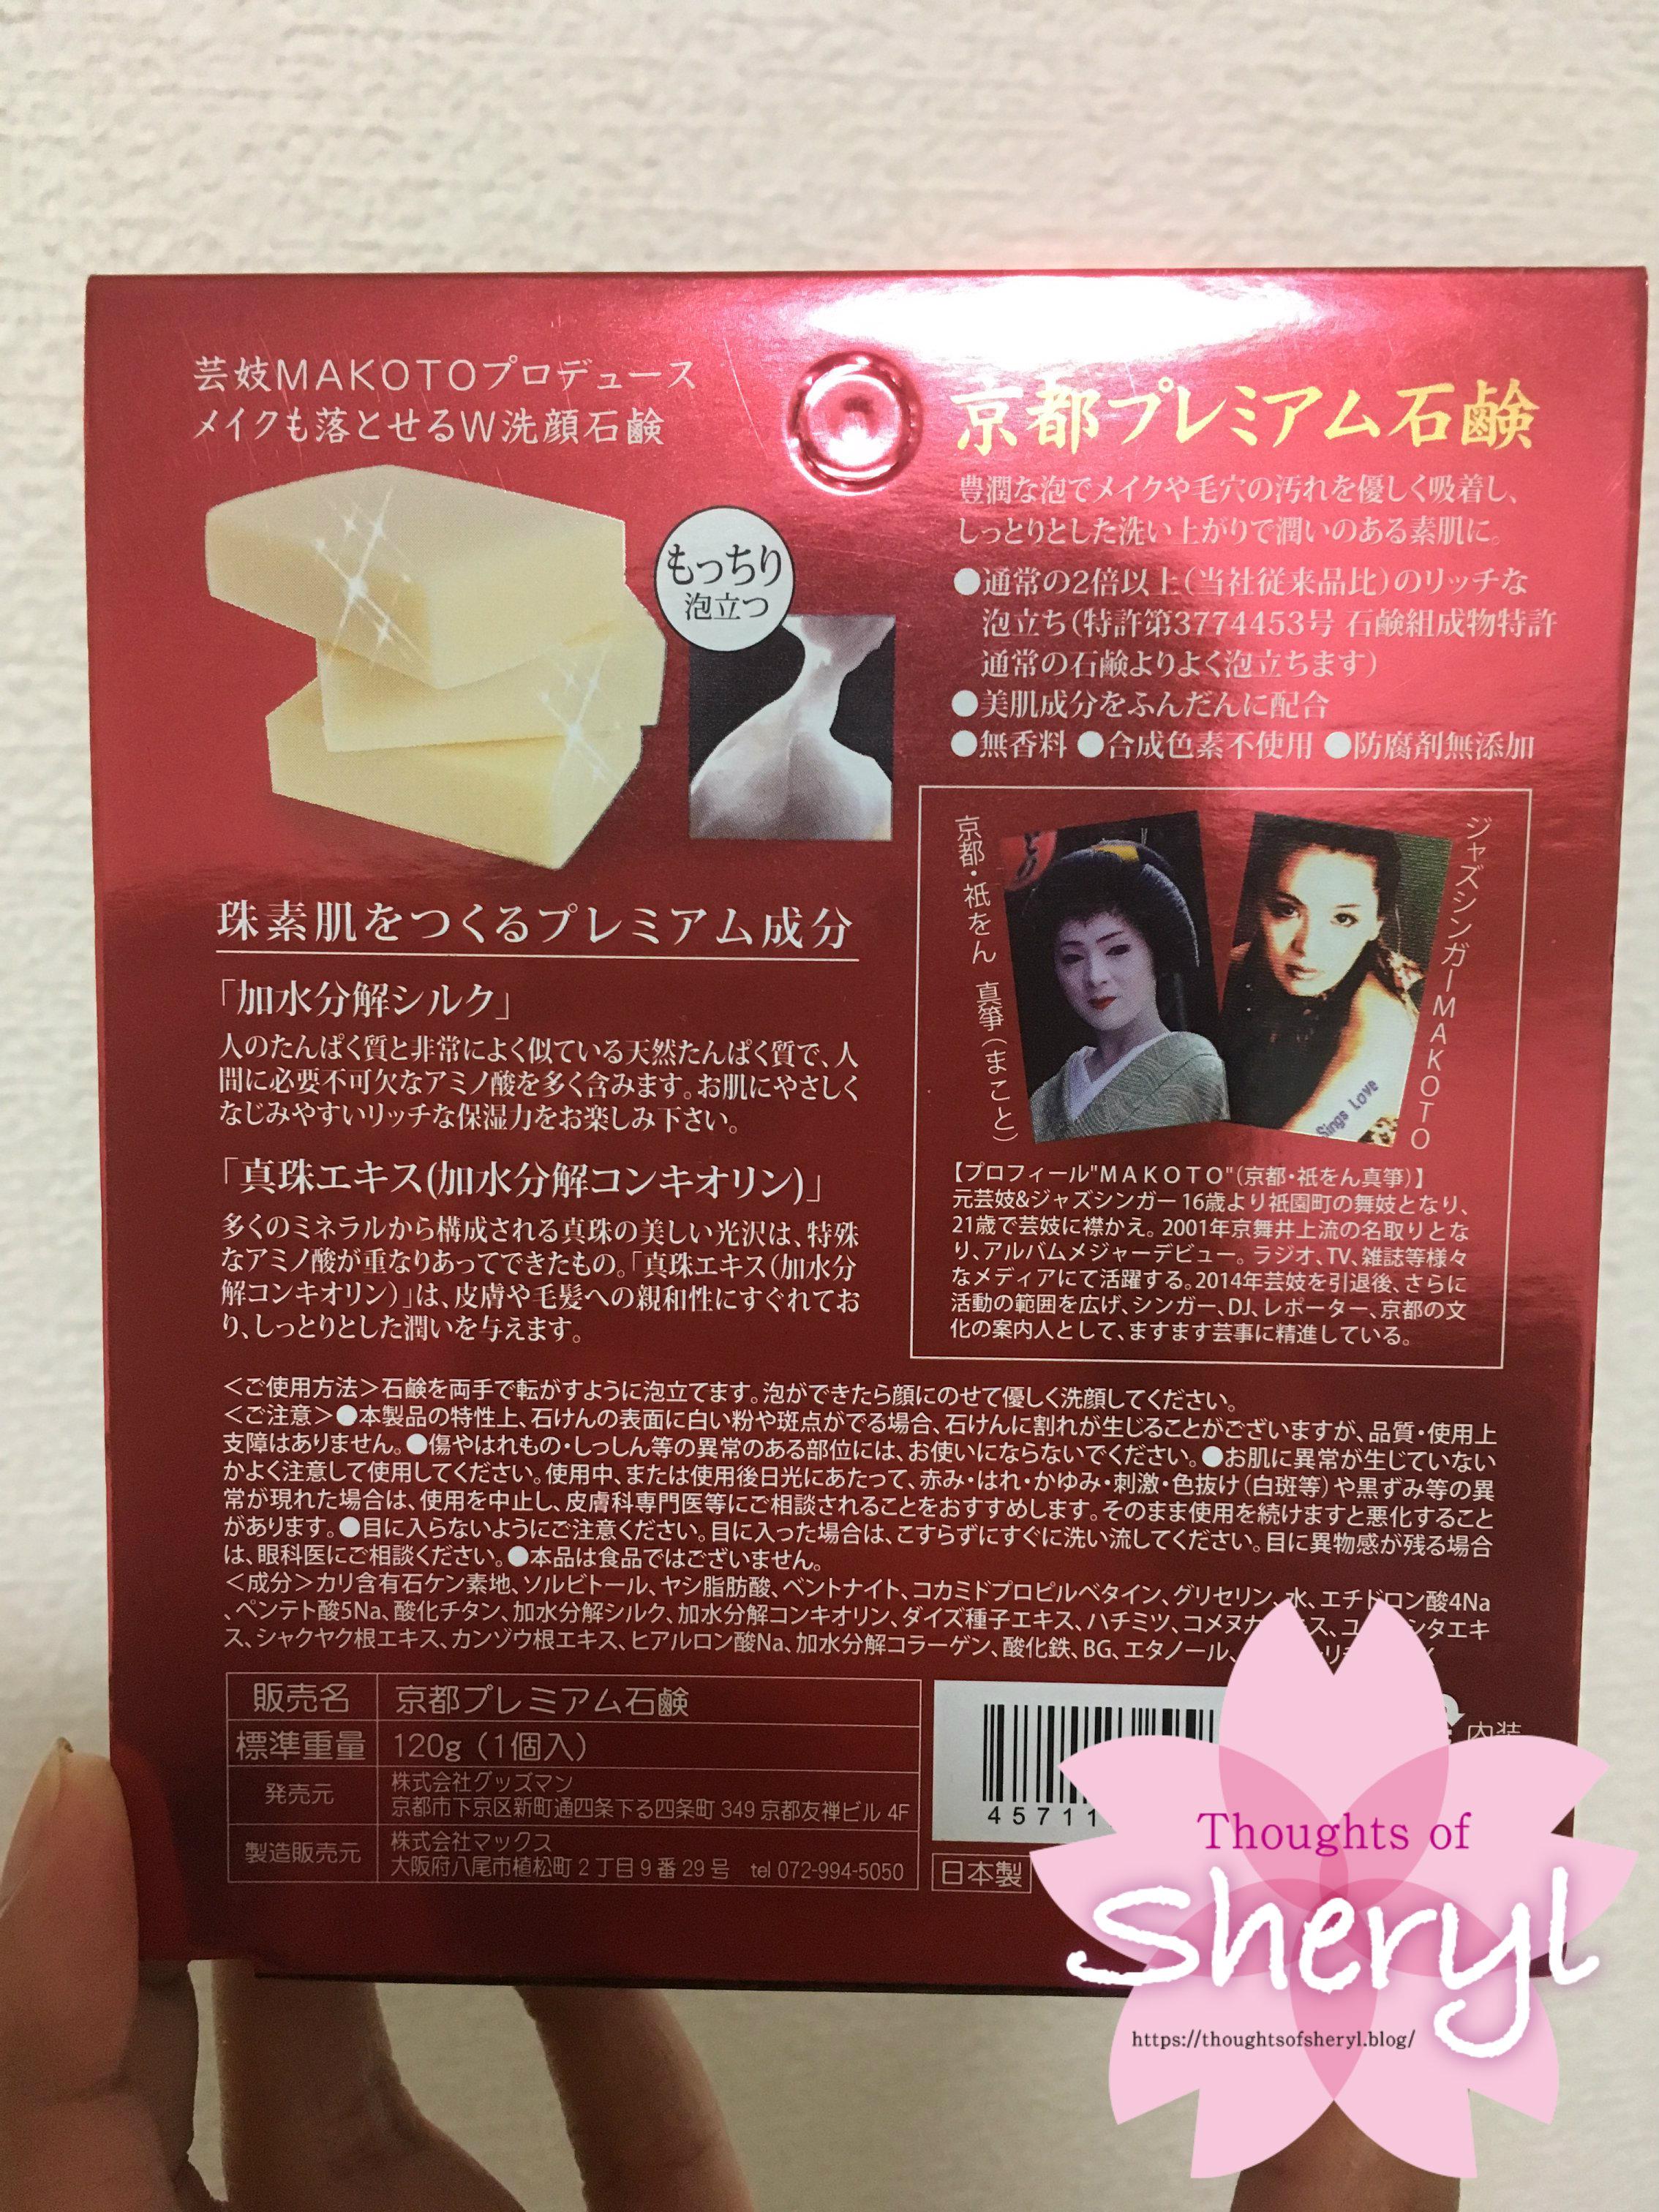 makoto kyoto premium soap ingredients